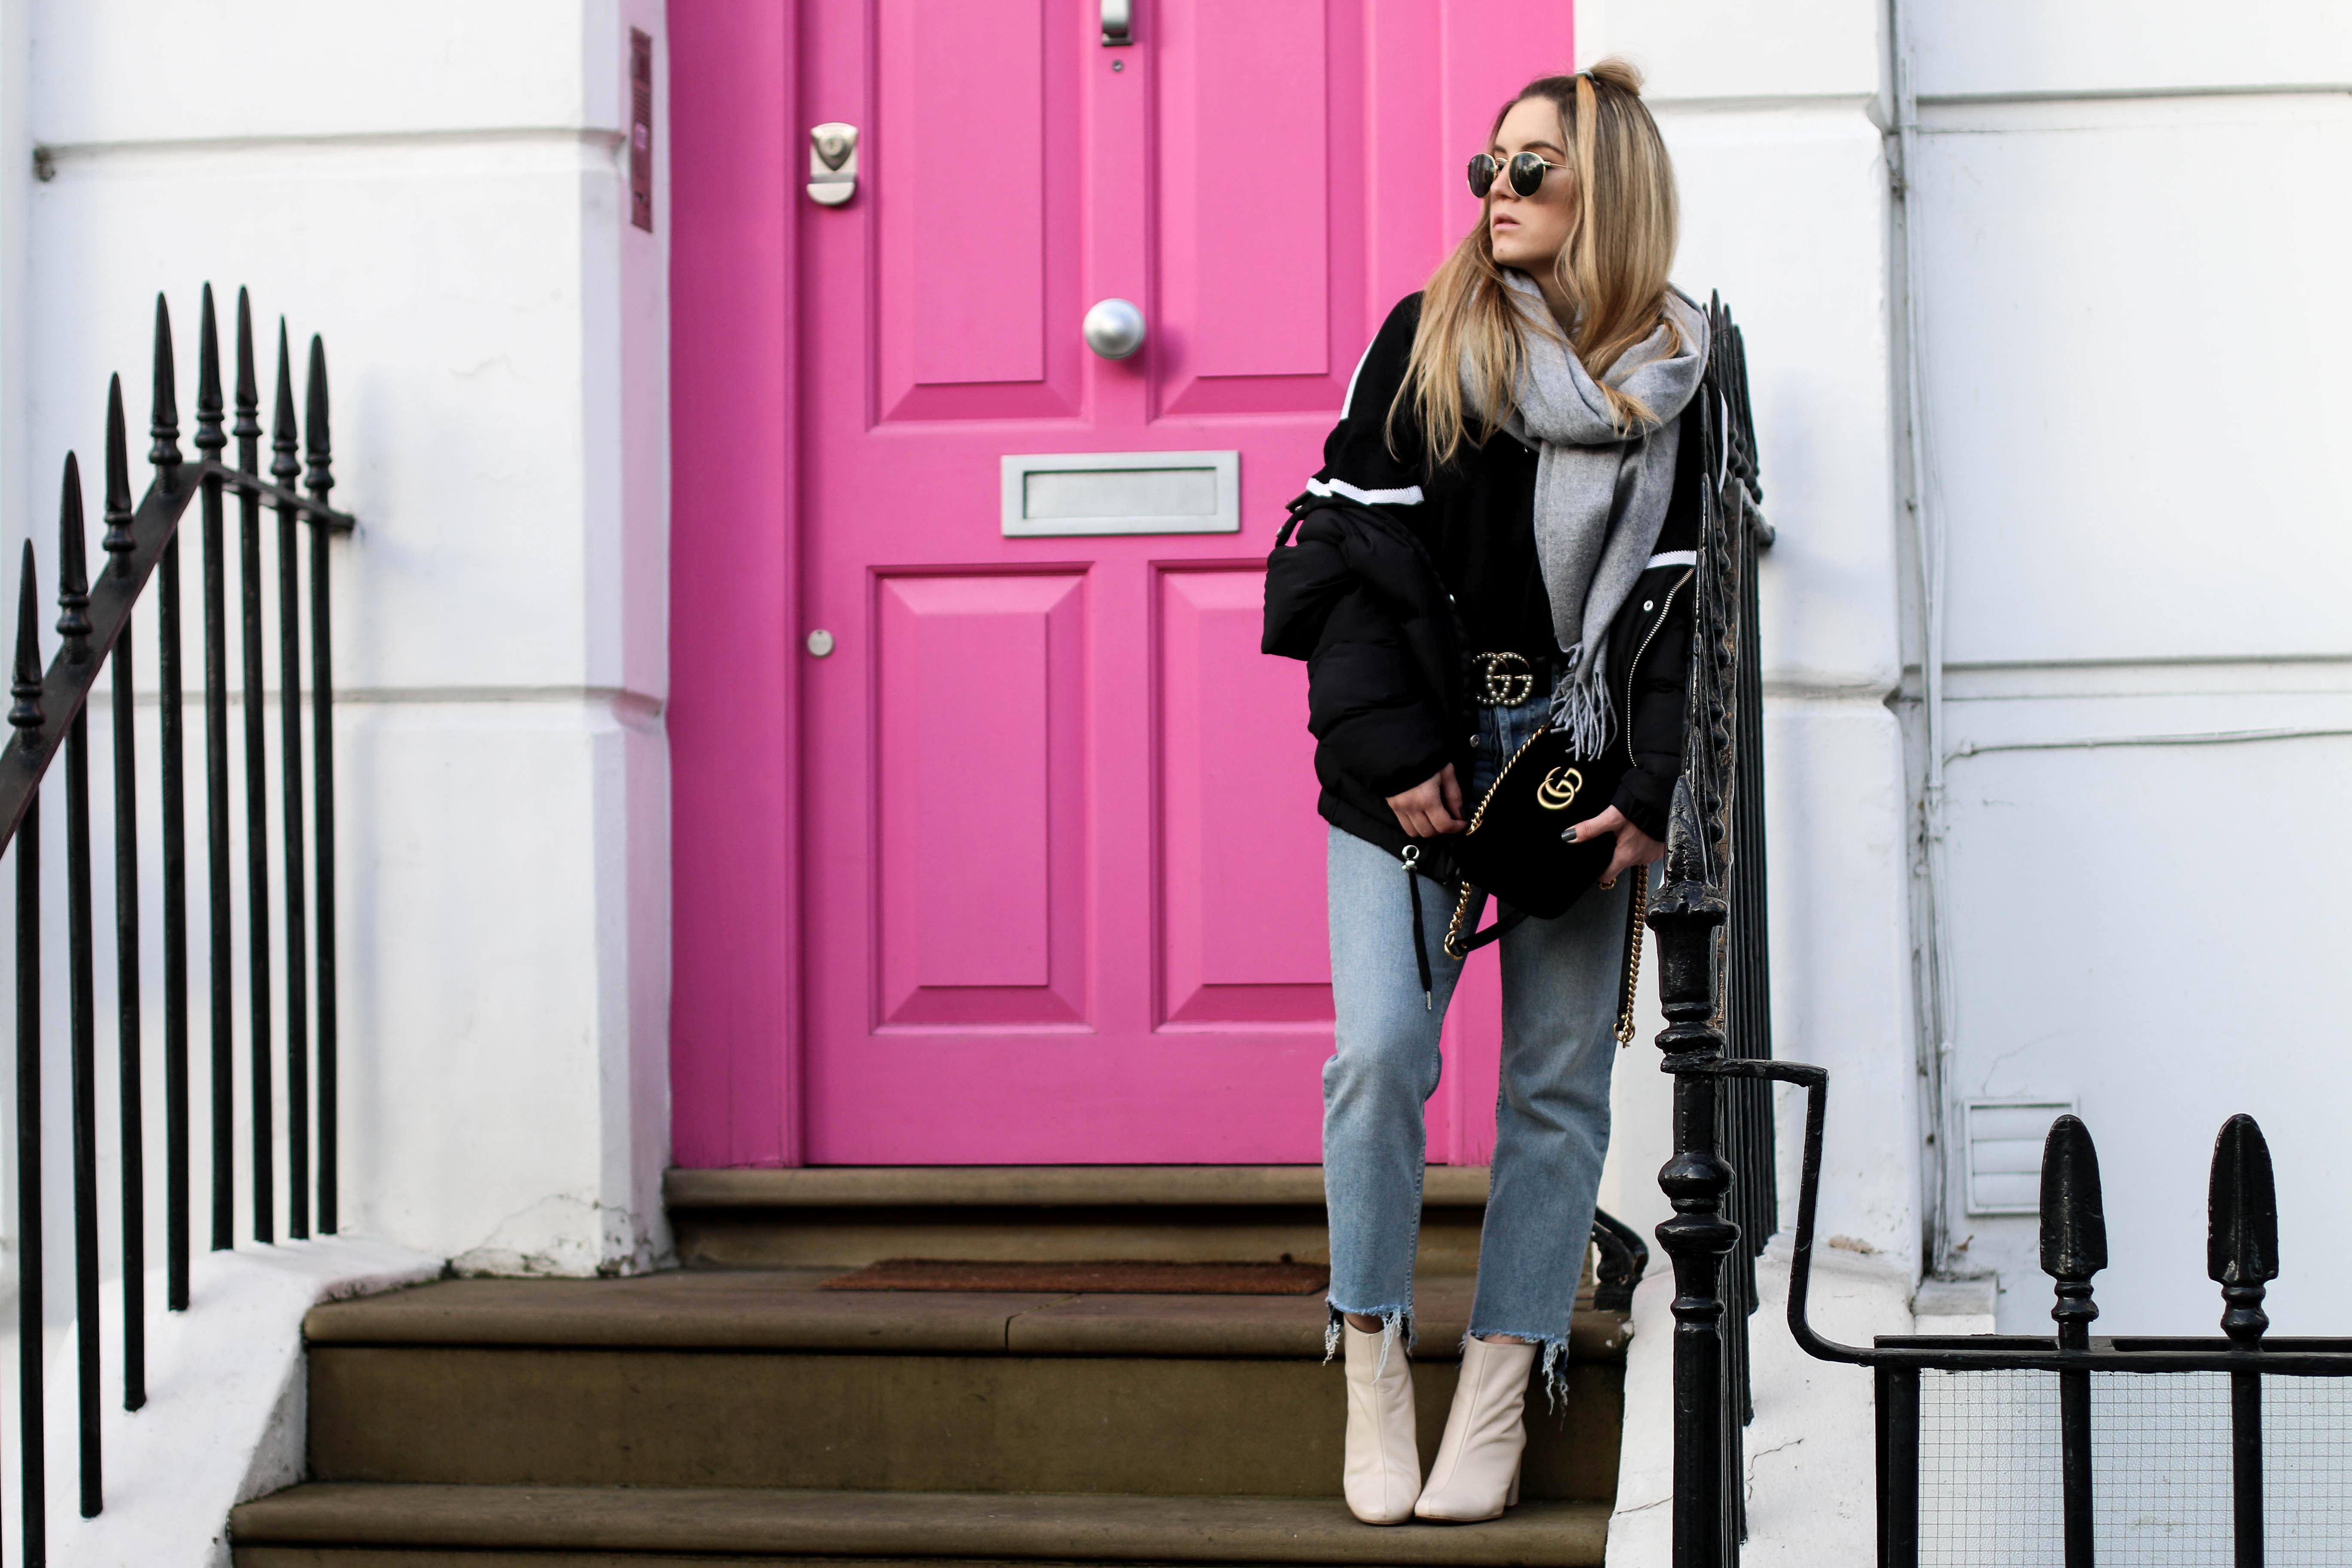 Gucci Gürtel GG Marmont Bag Fashiontwinstinct London